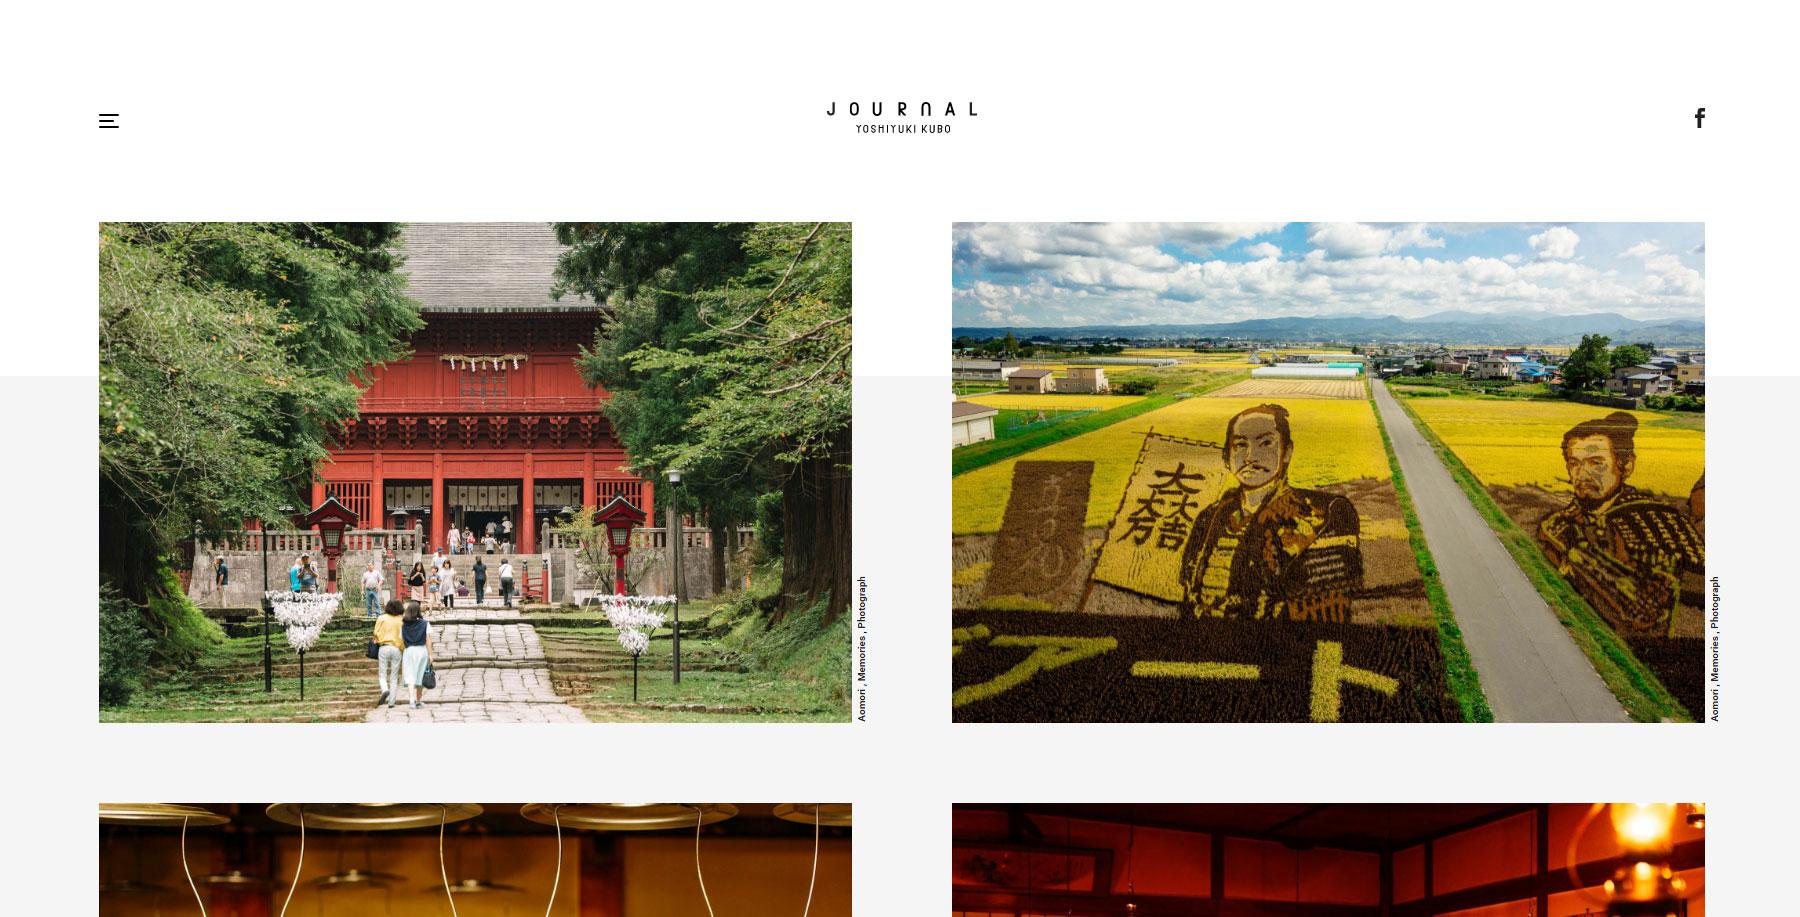 YOSHIYUKI KUBO - Website of the Day